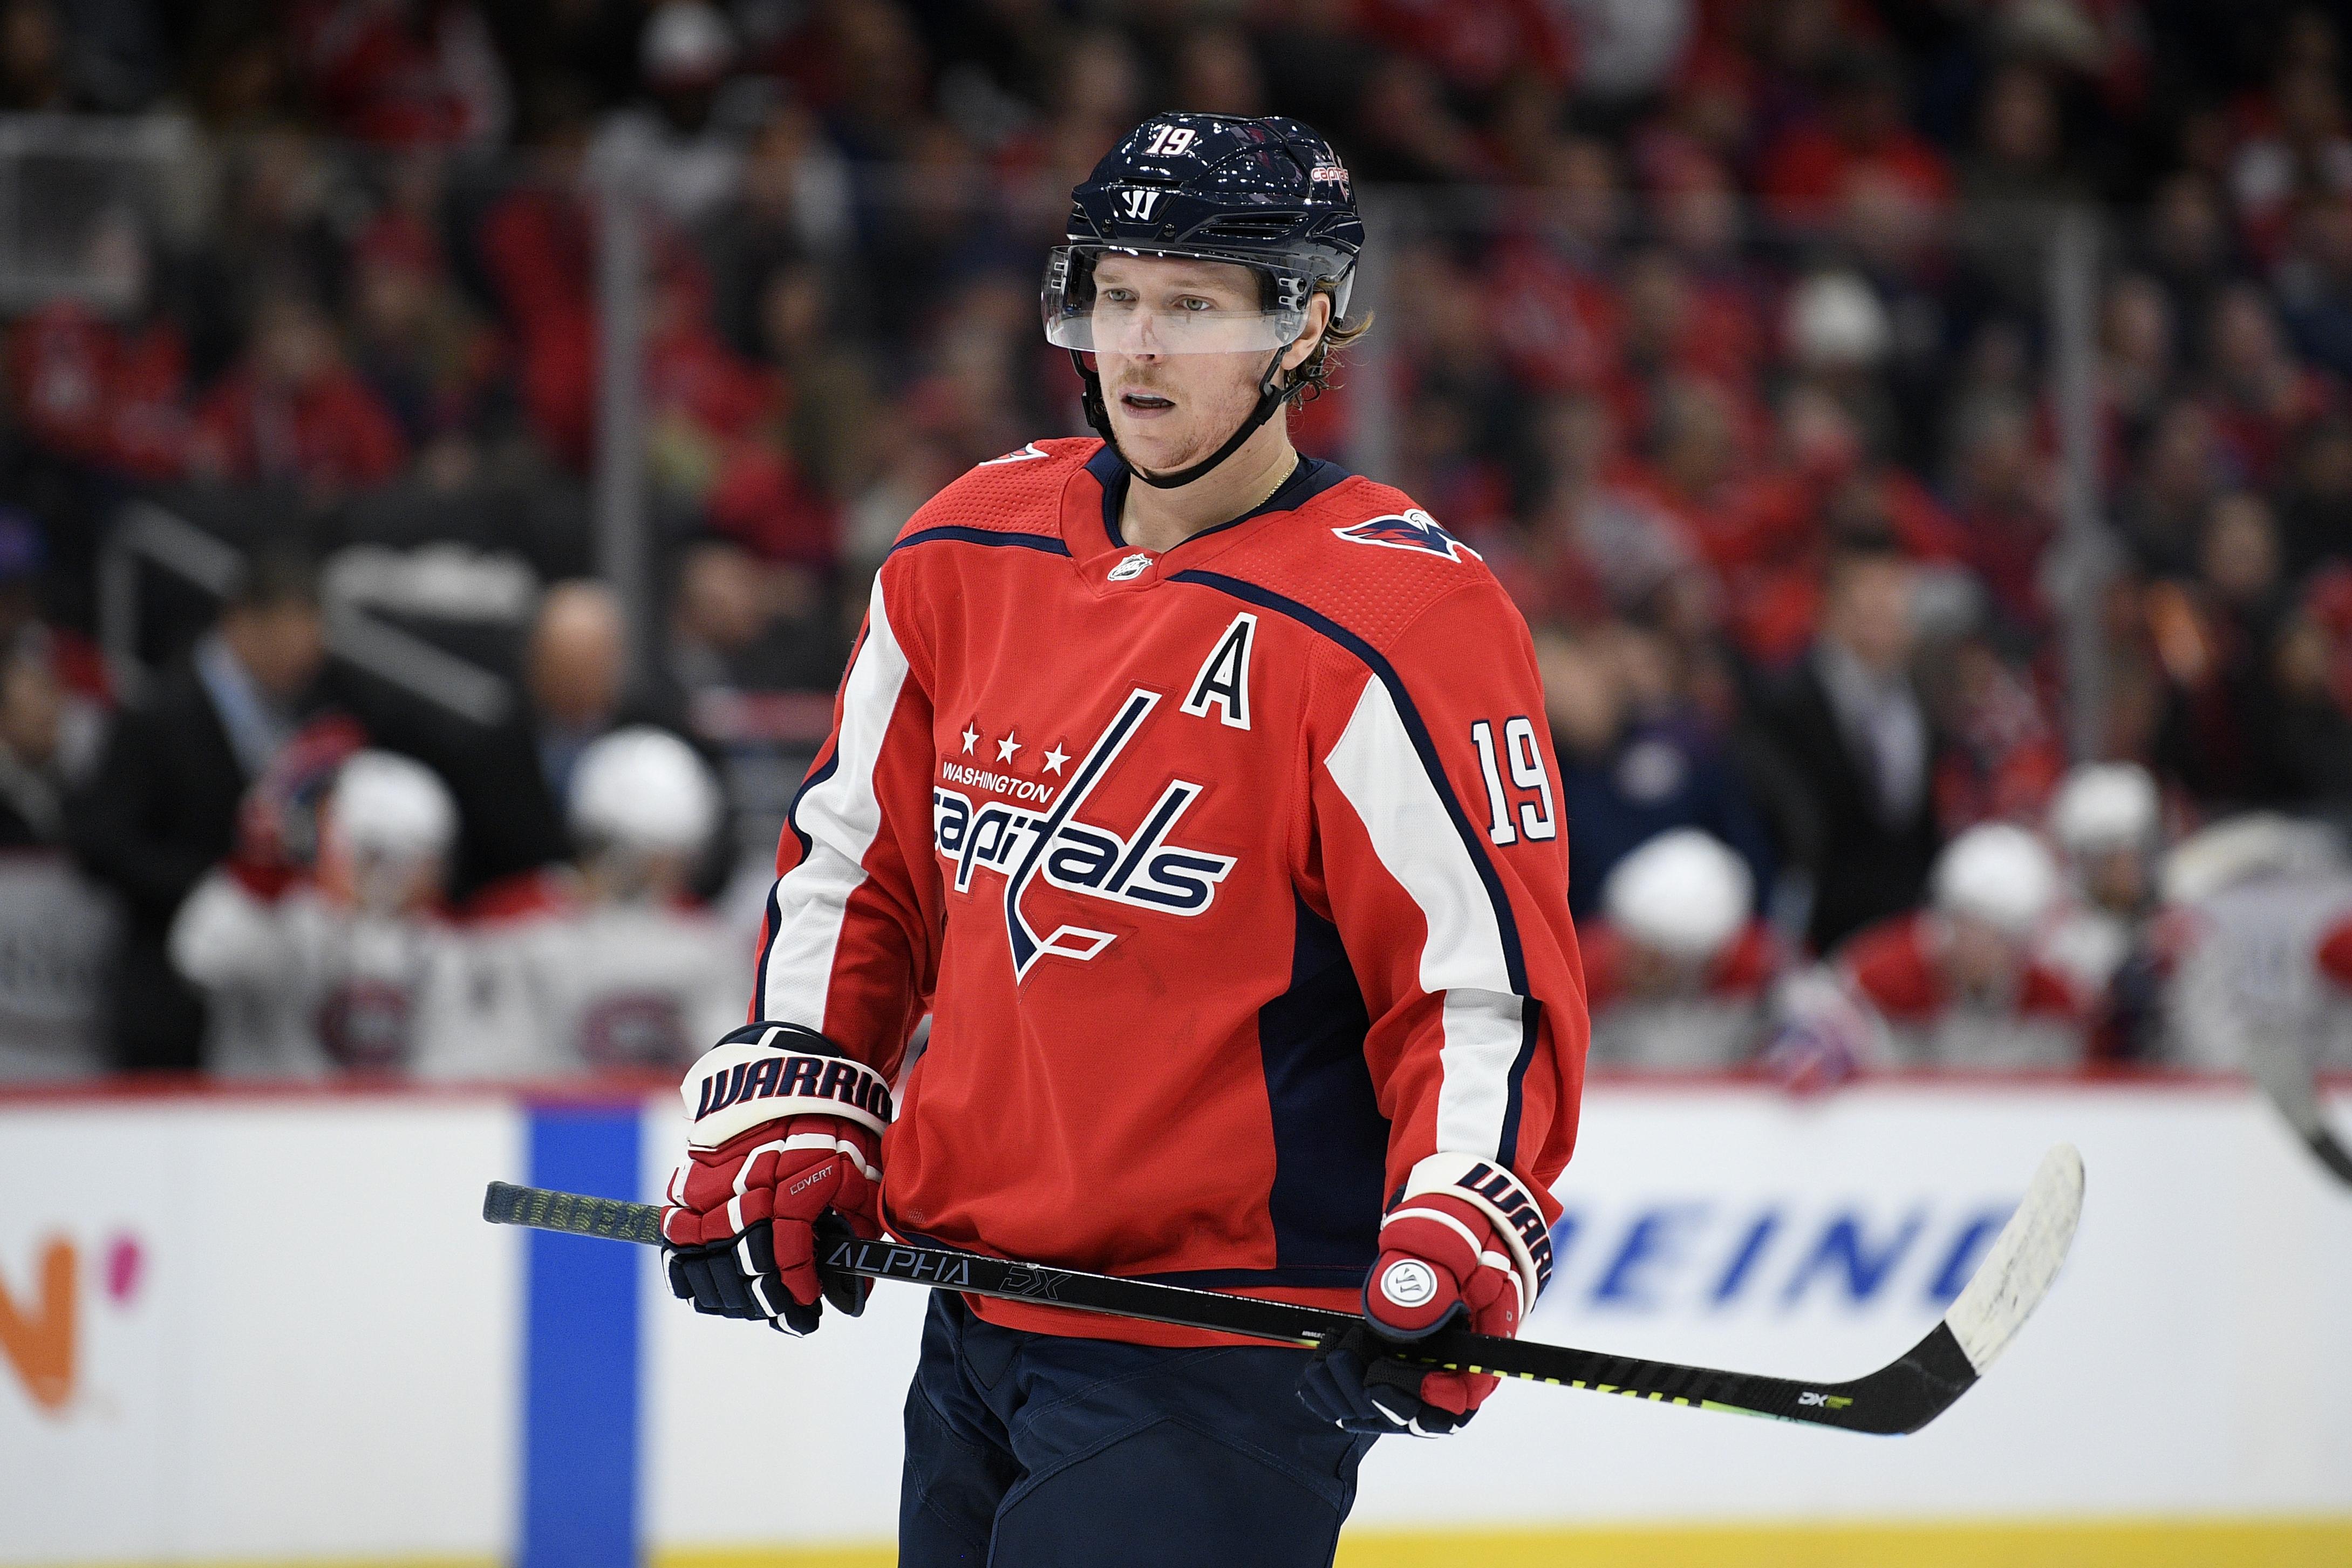 https://media.washtimes.com/media/image/2019/11/17/Canadiens_Capitals_Hockey_90144.jpg-55ee8.jpg